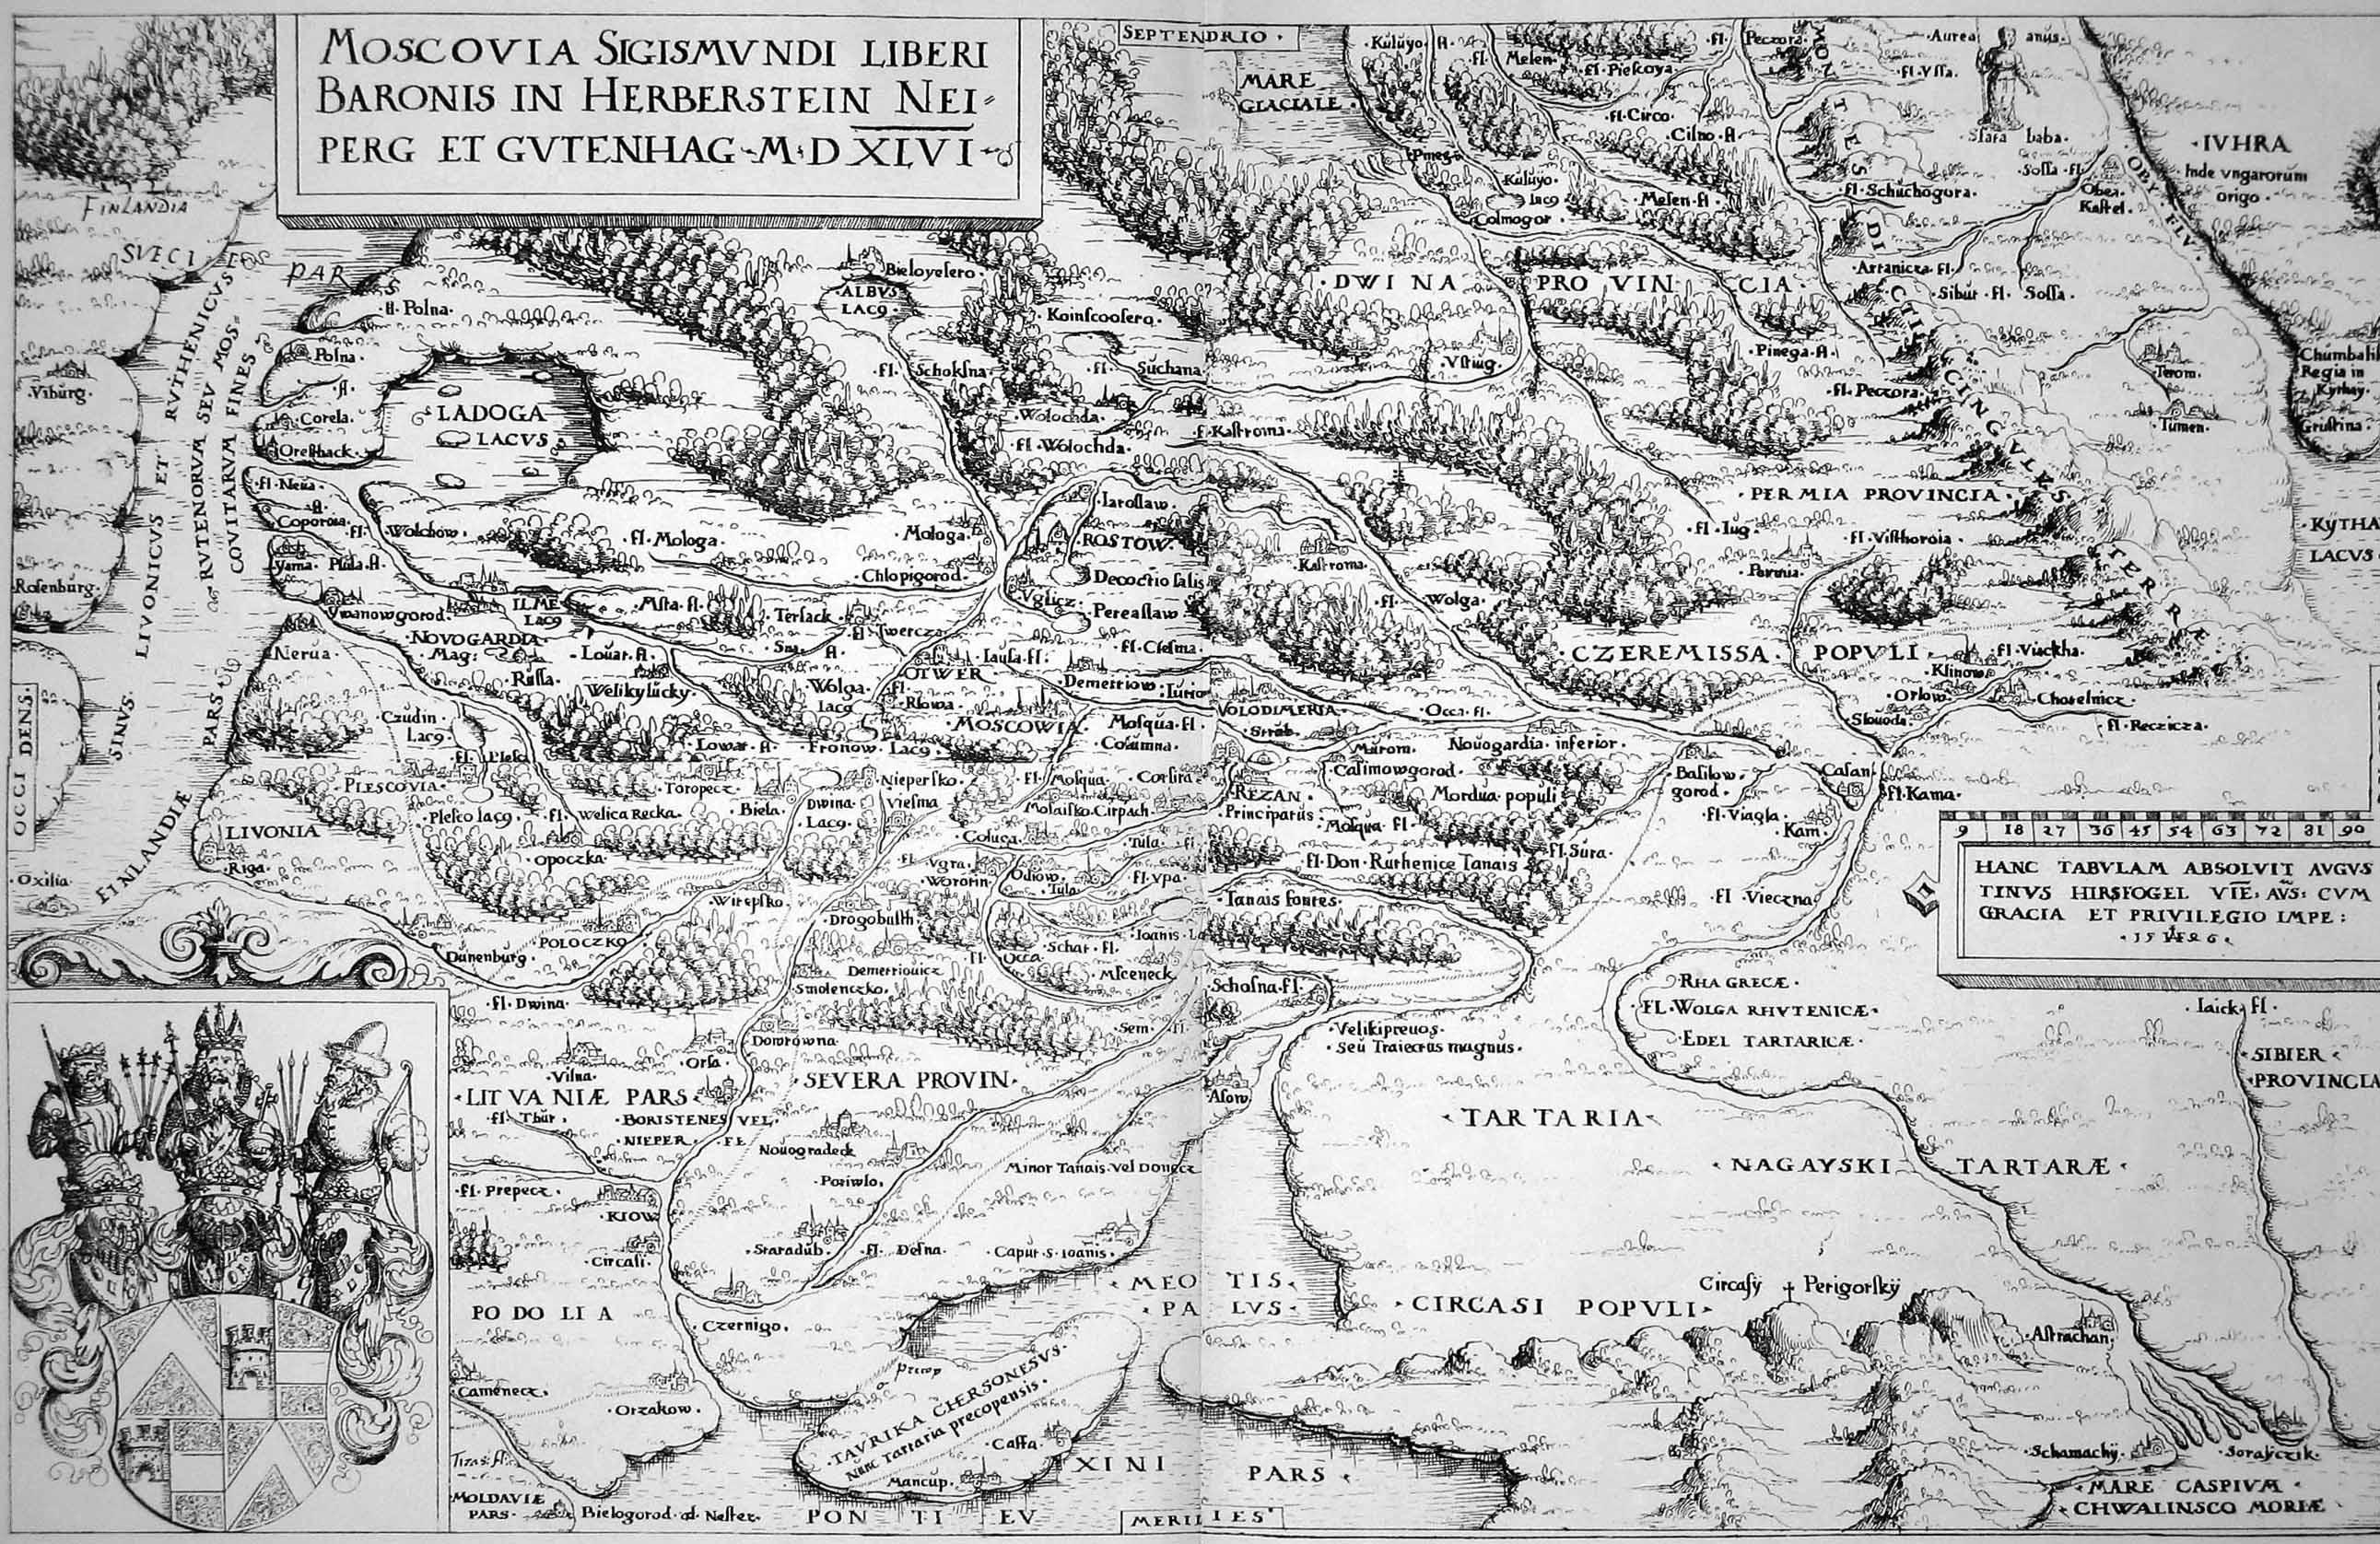 Карта Сигизмунда Герберштейна 1546 г.